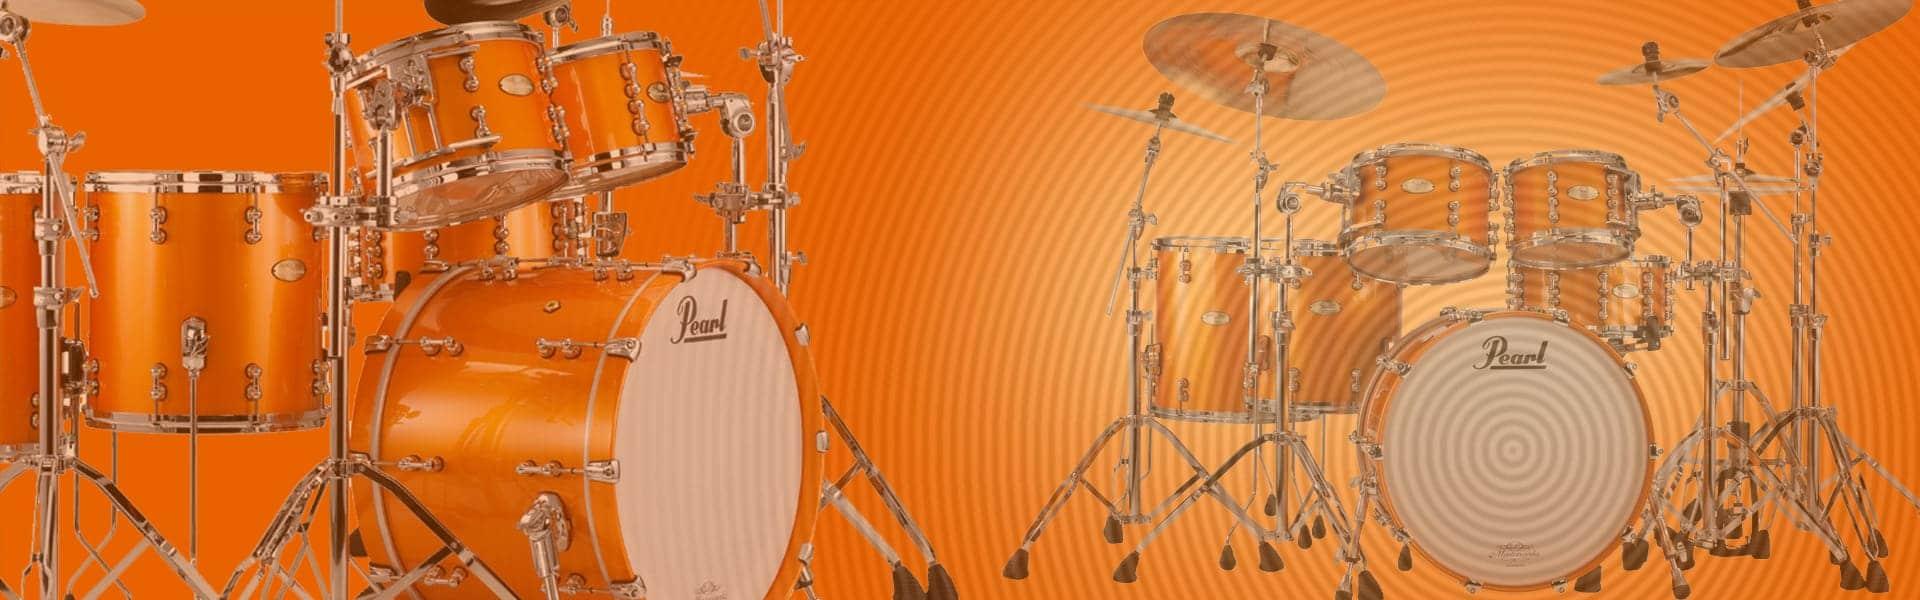 Responsive Website Development Software Development & VBulletin upgrades For Pearl Drums